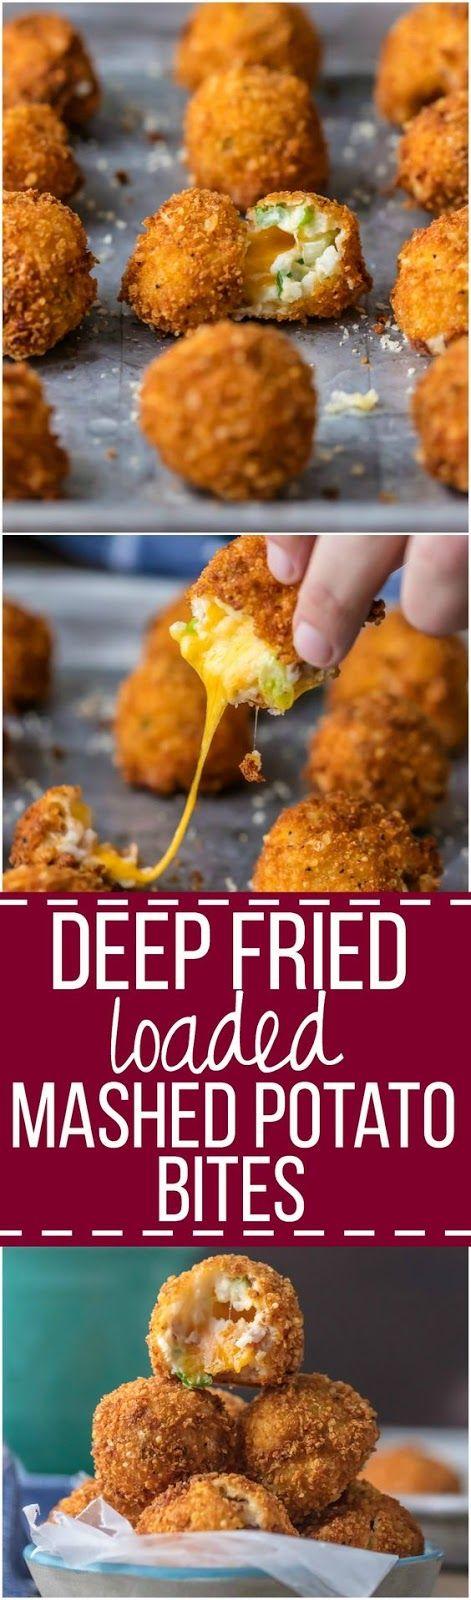 DEEP FRIED LOADED MASHED POTATO BITES | Food And Cake Recipes